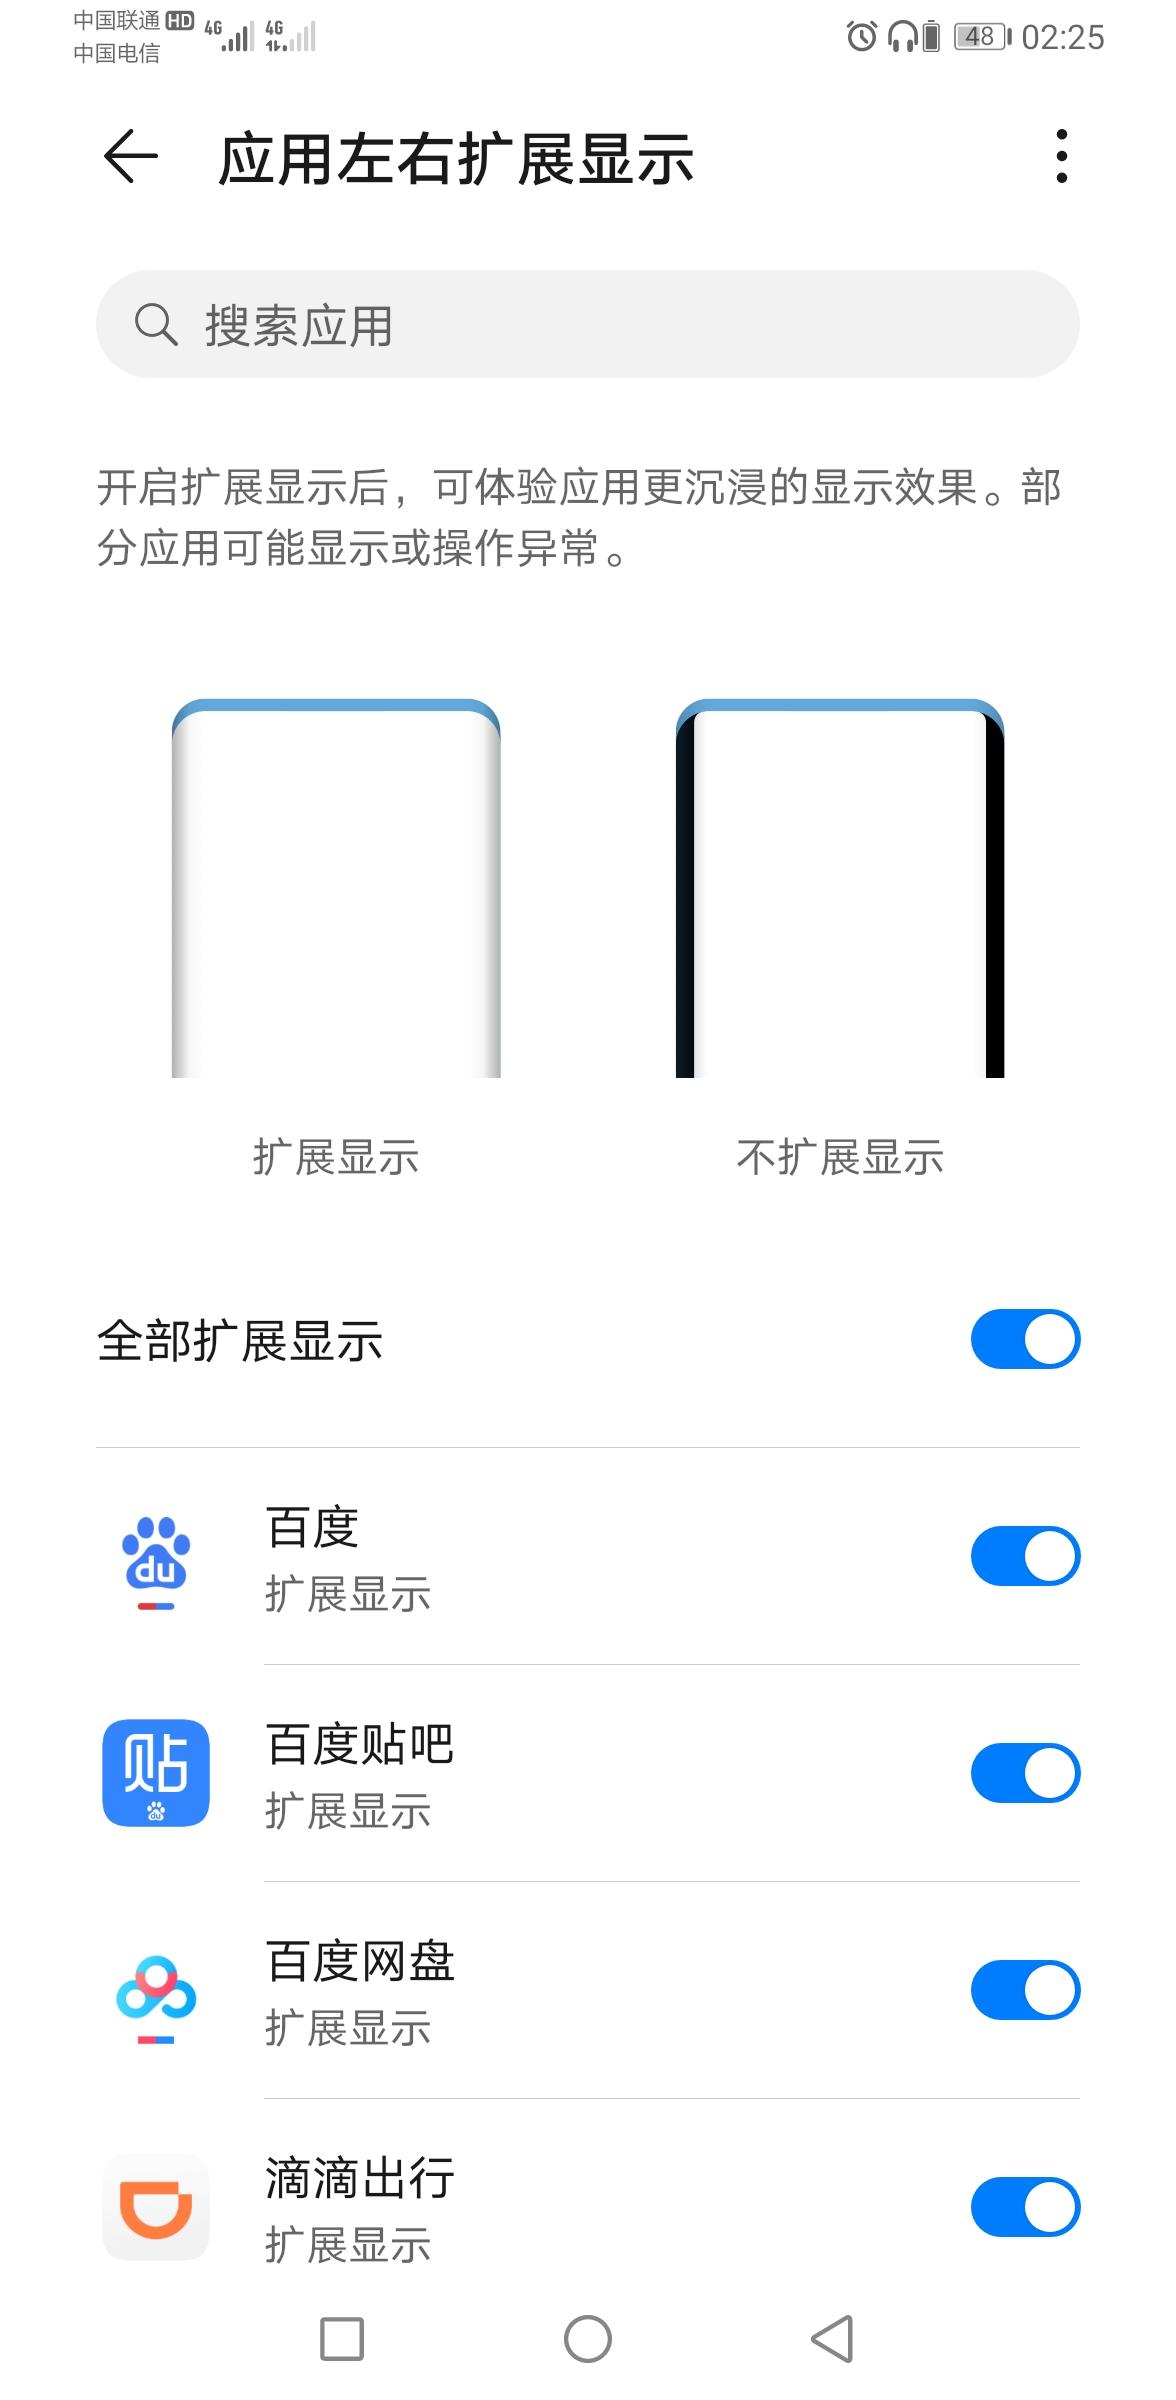 Screenshot_20200517_022532_com.android.settings.jpg